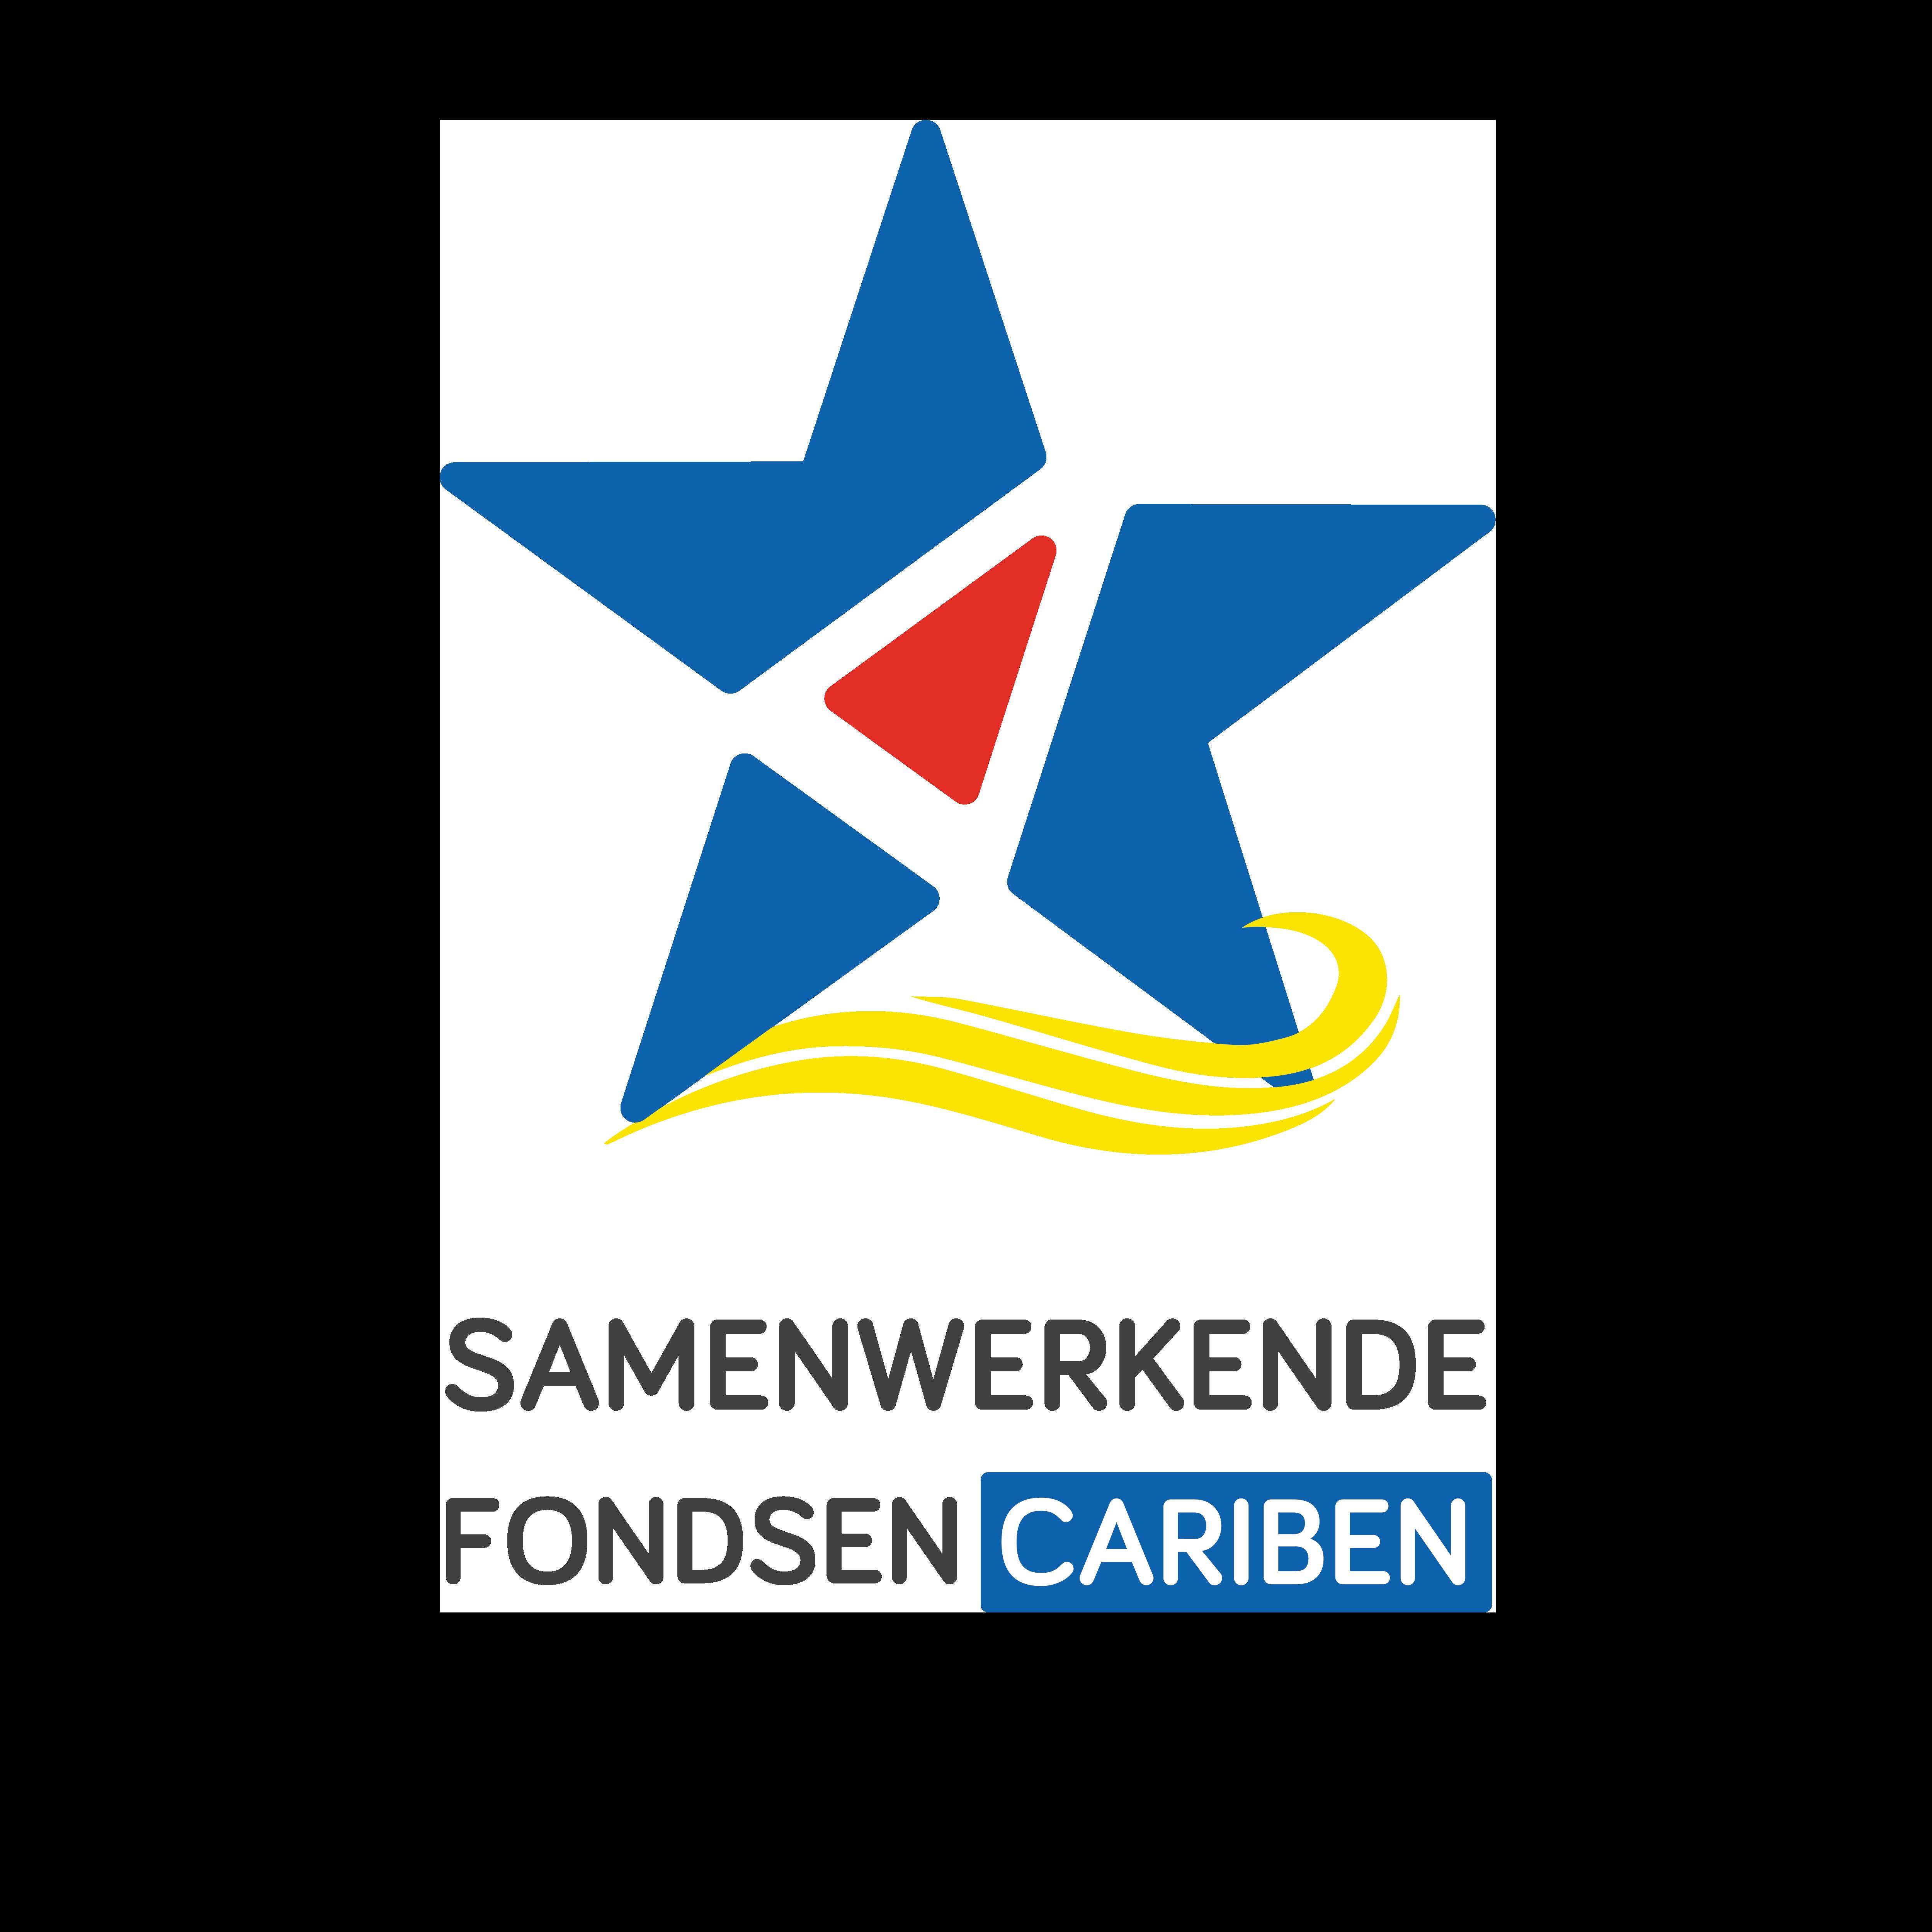 Samenwerkende Fondsen Cariben